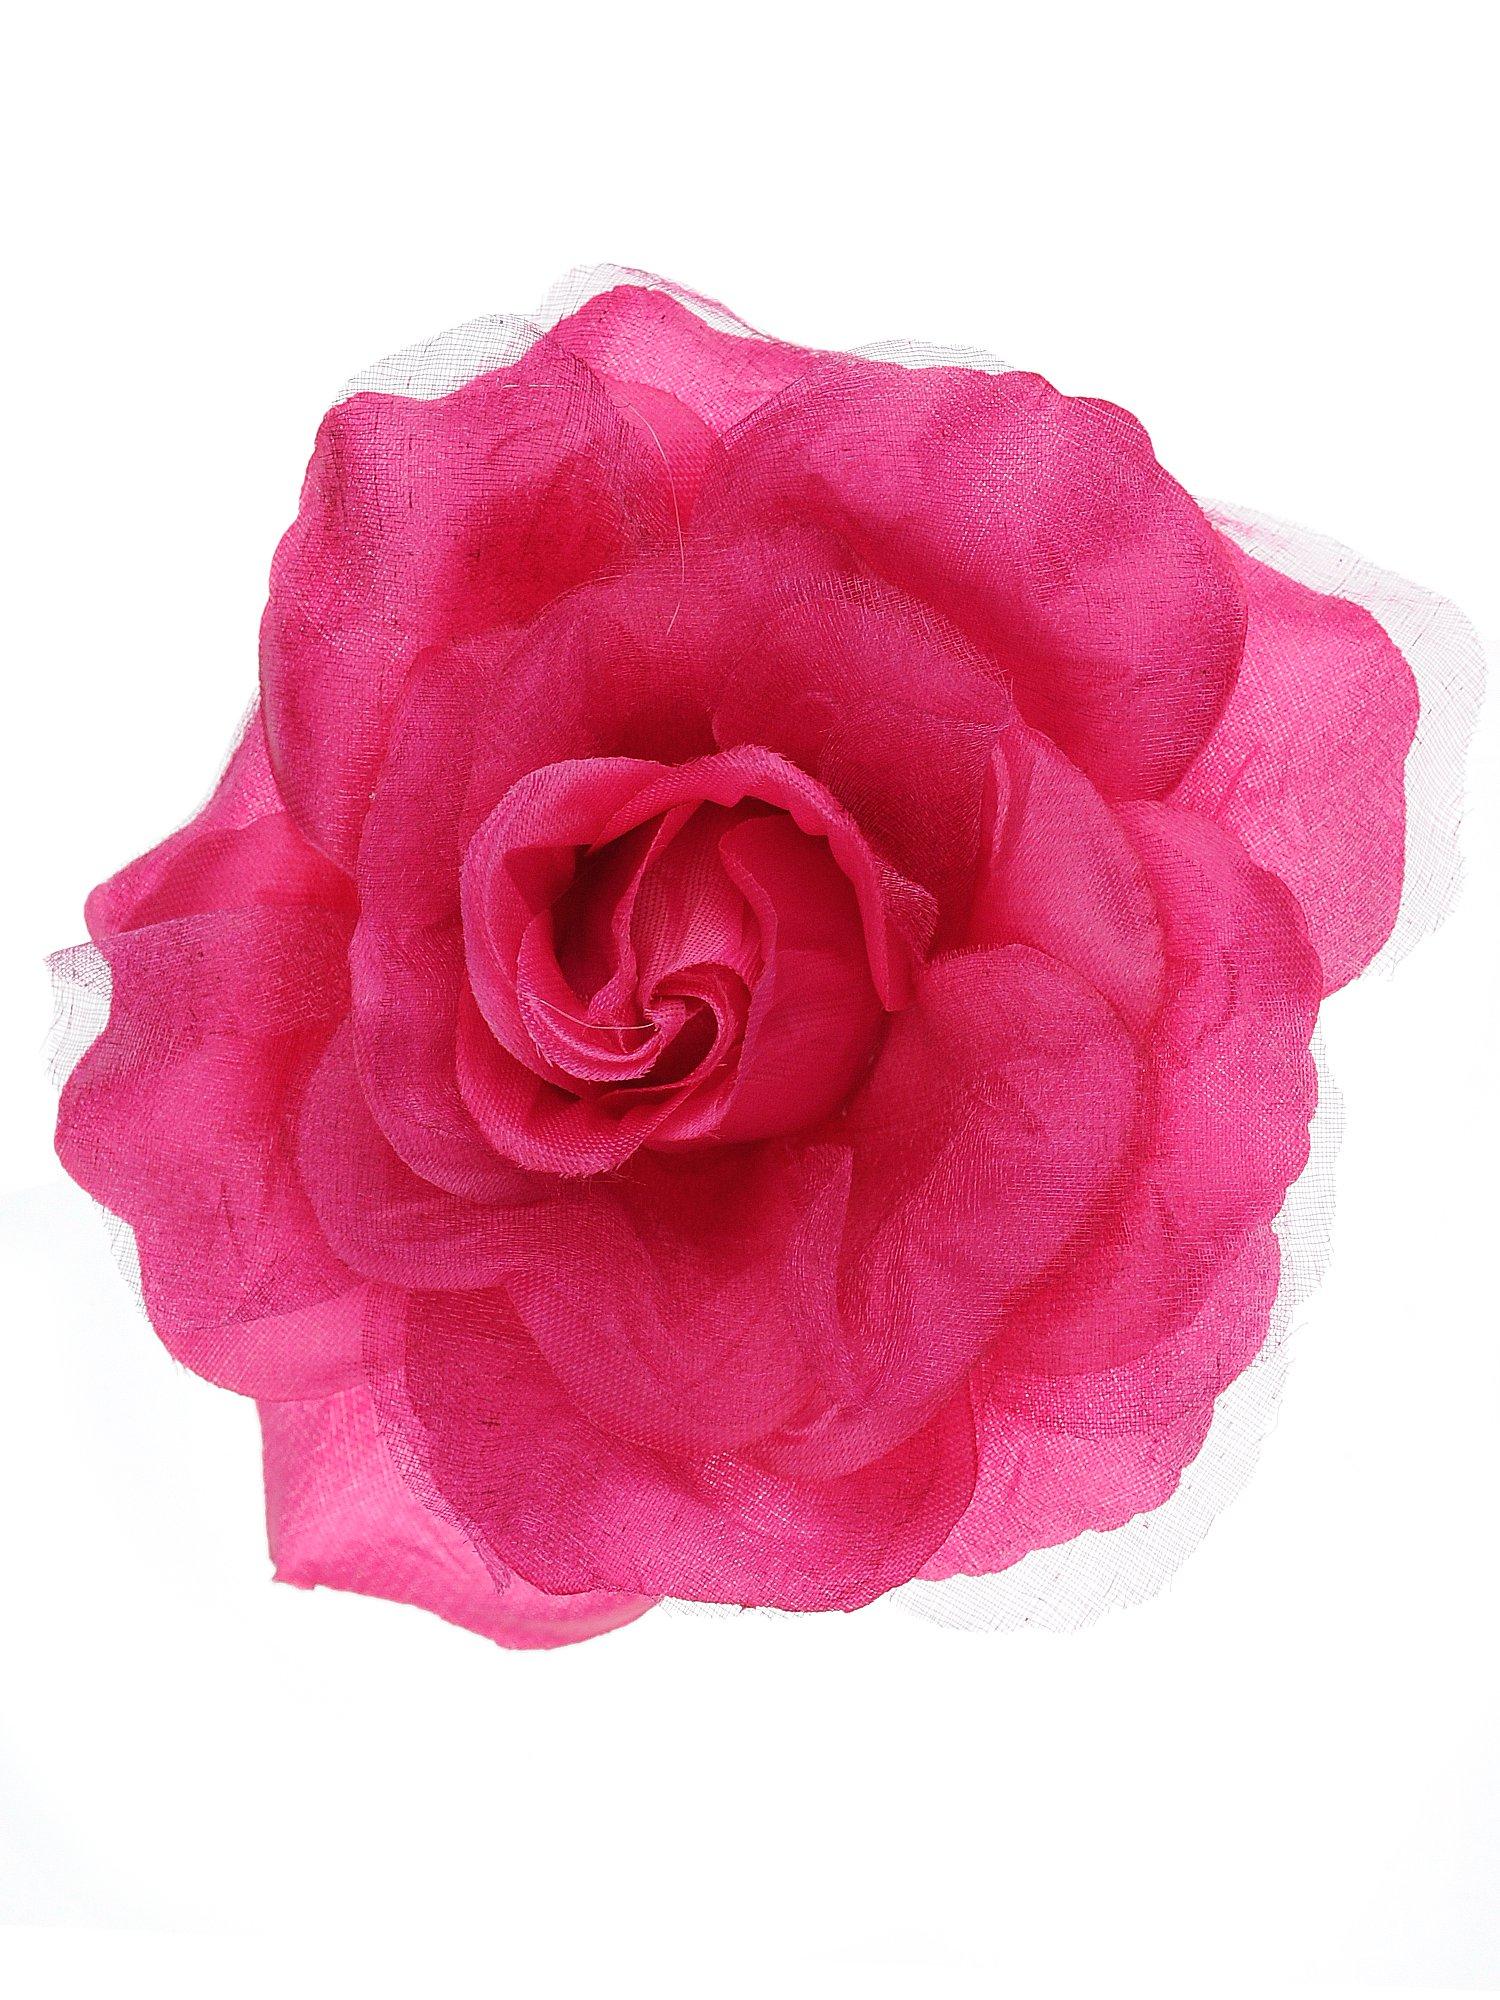 NYFASHION101 Women's Multifunction Rose Flower Sheer Petal Brooch Pin Hair Tie Clip By The Dozen, Hot Pink